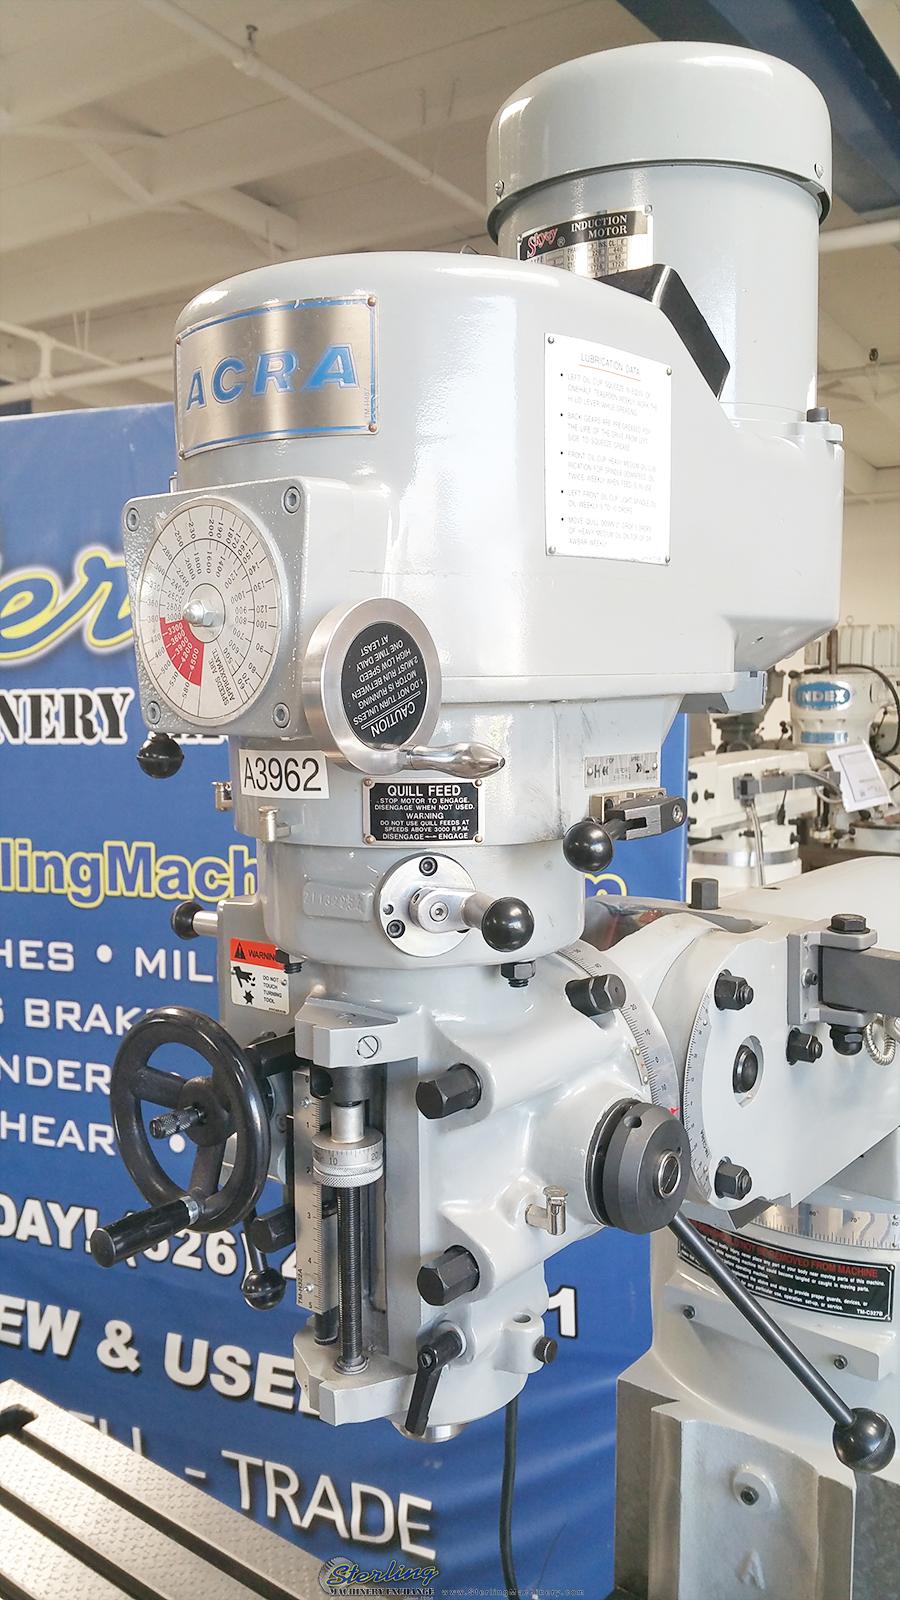 Brand New Acra Variable Speed Knee Milling Machine